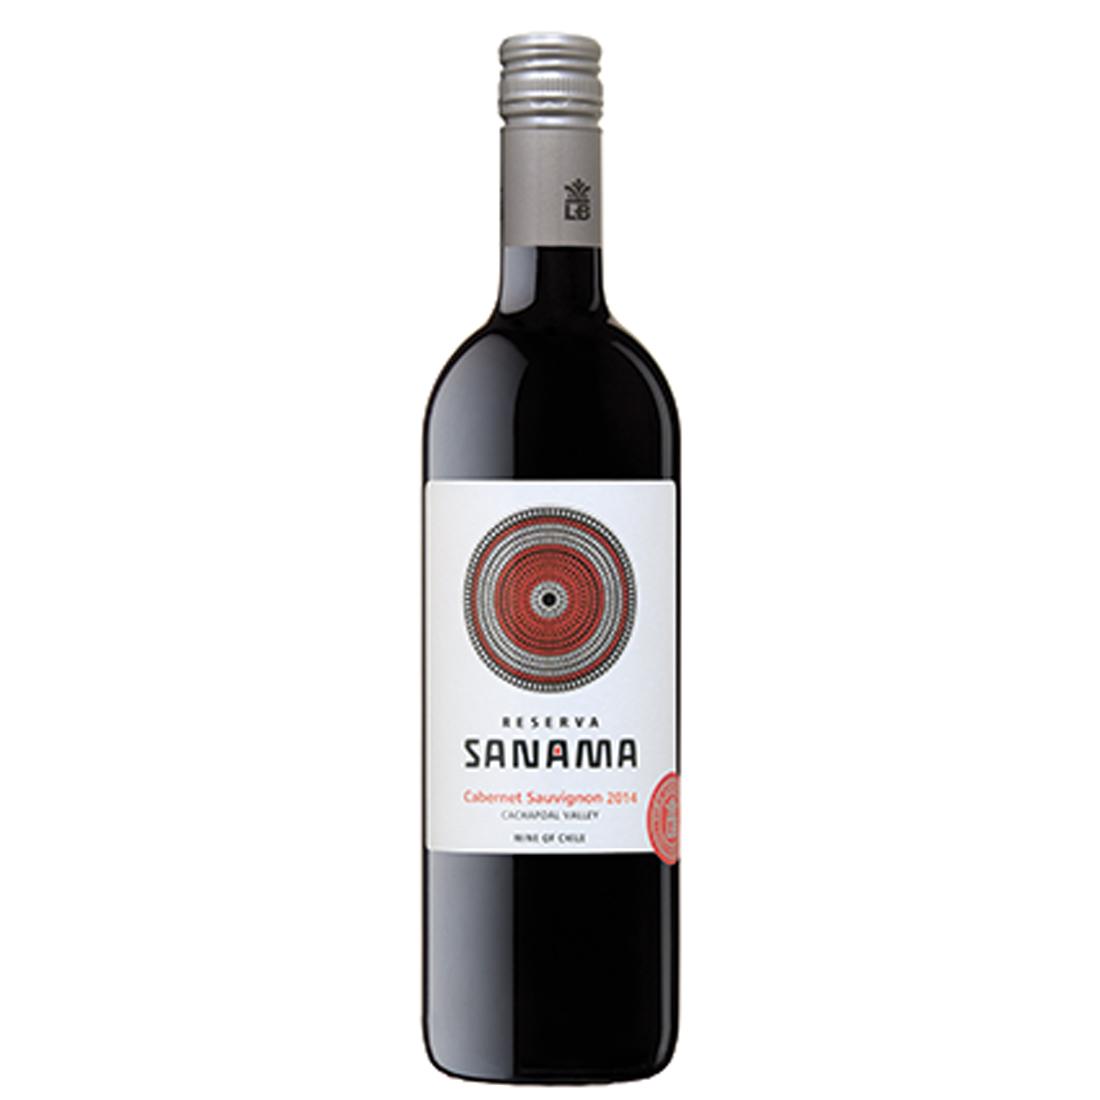 Vinho Sanama Reserva Carbenet Sauvignon / Syrah 750 ml